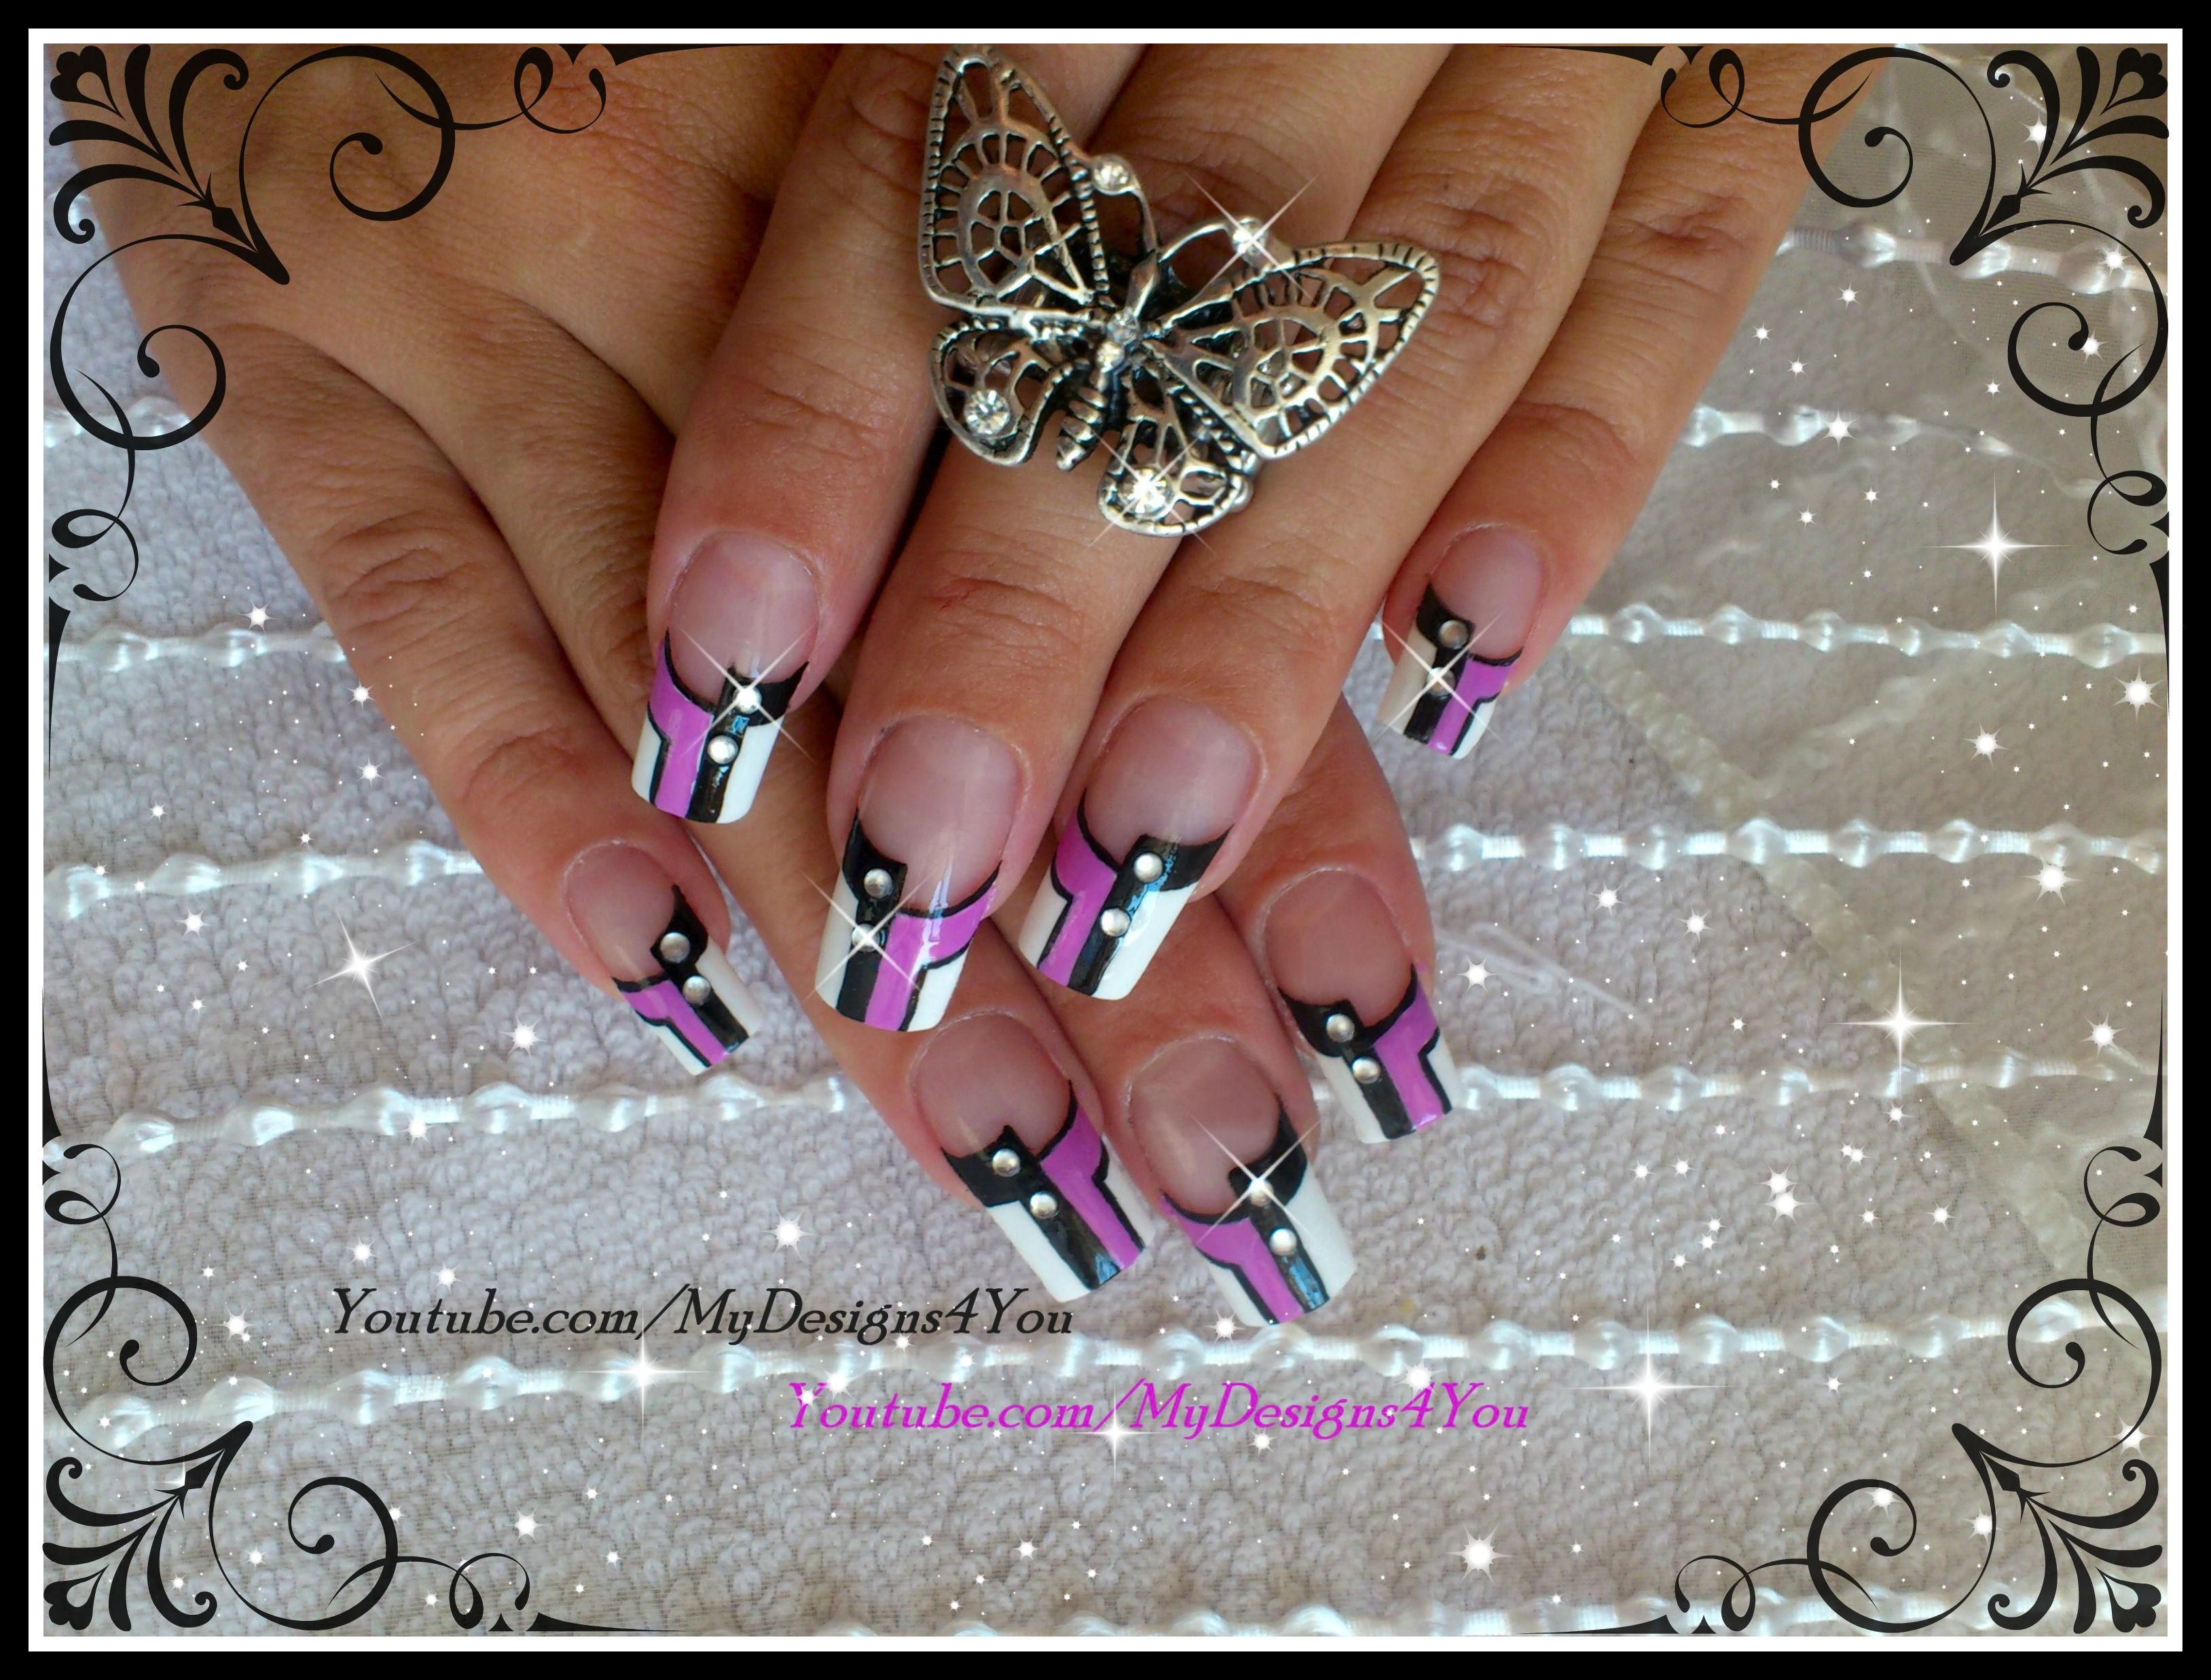 Lavender Monochrome Nail Art By Mydesigns4you Nails Lavendernails